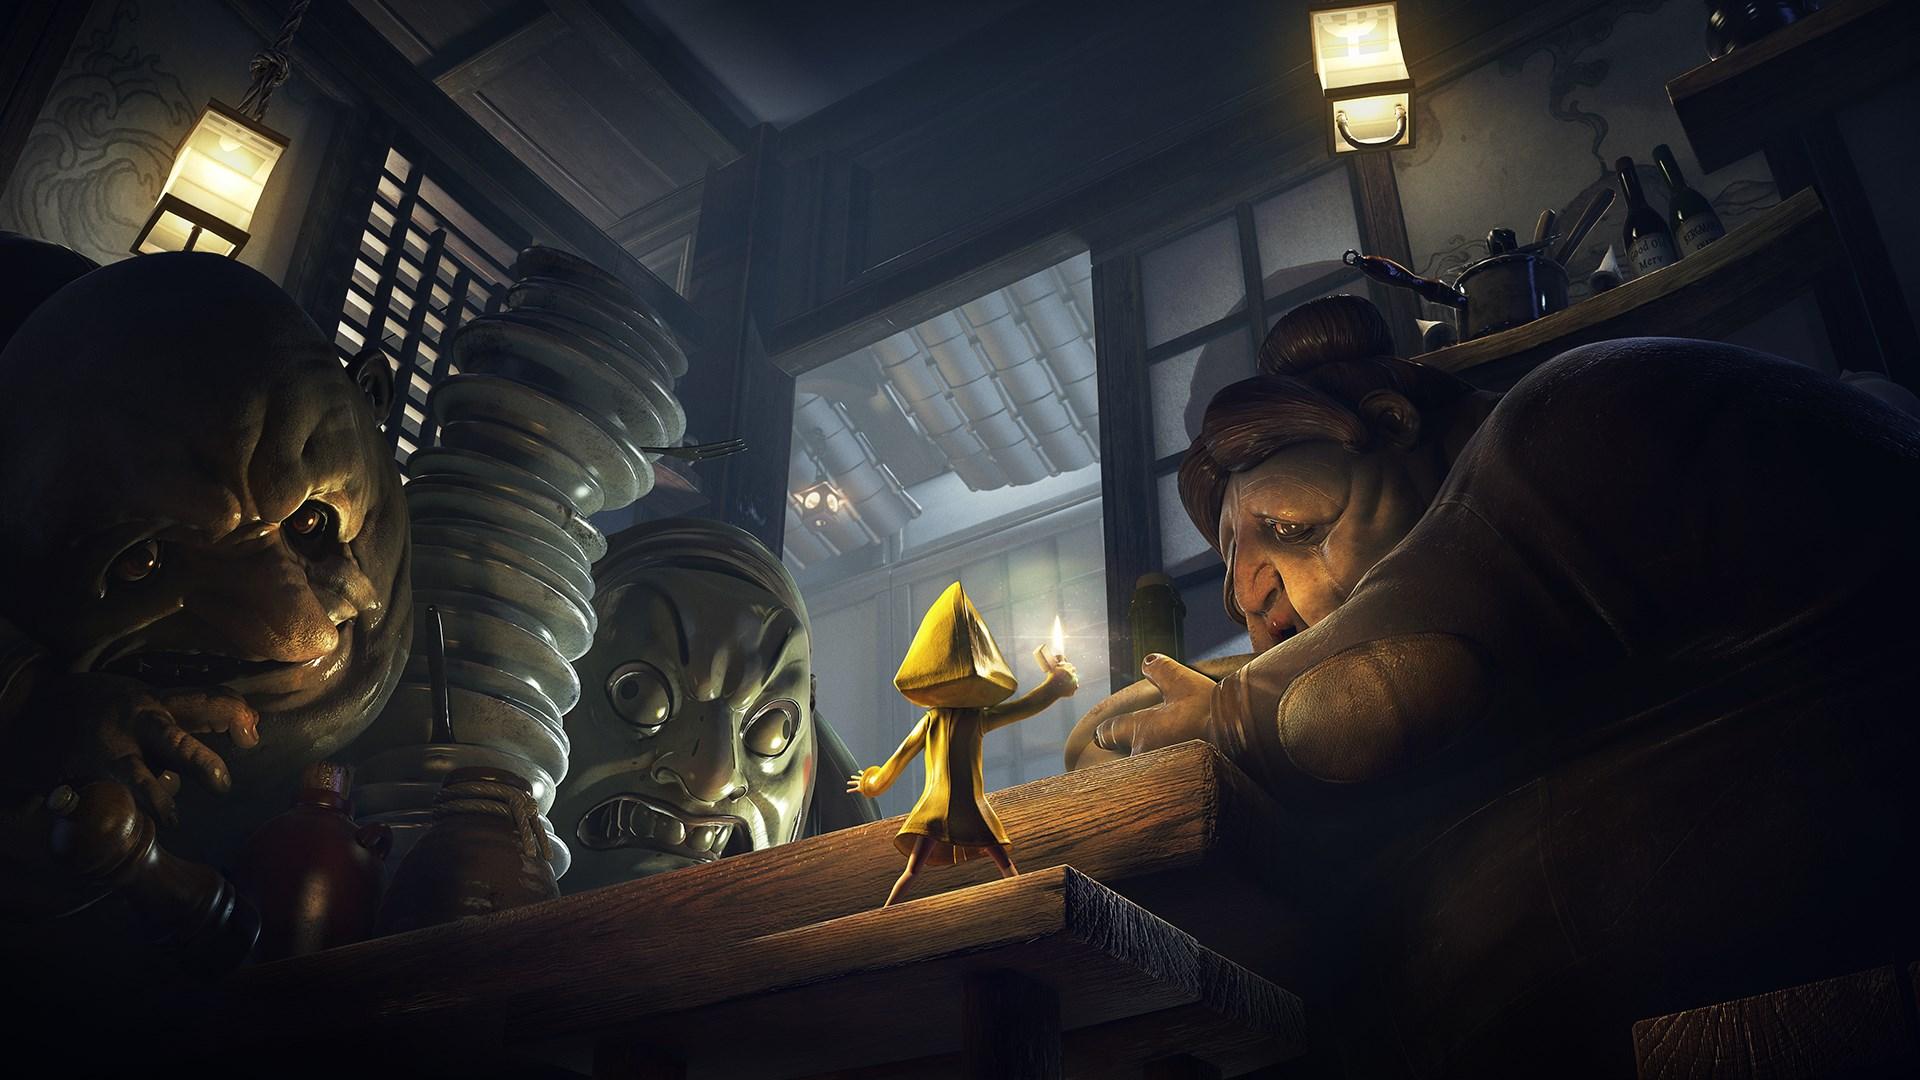 Narrative Design on Little Nightmares - Dave Mervik (#182)